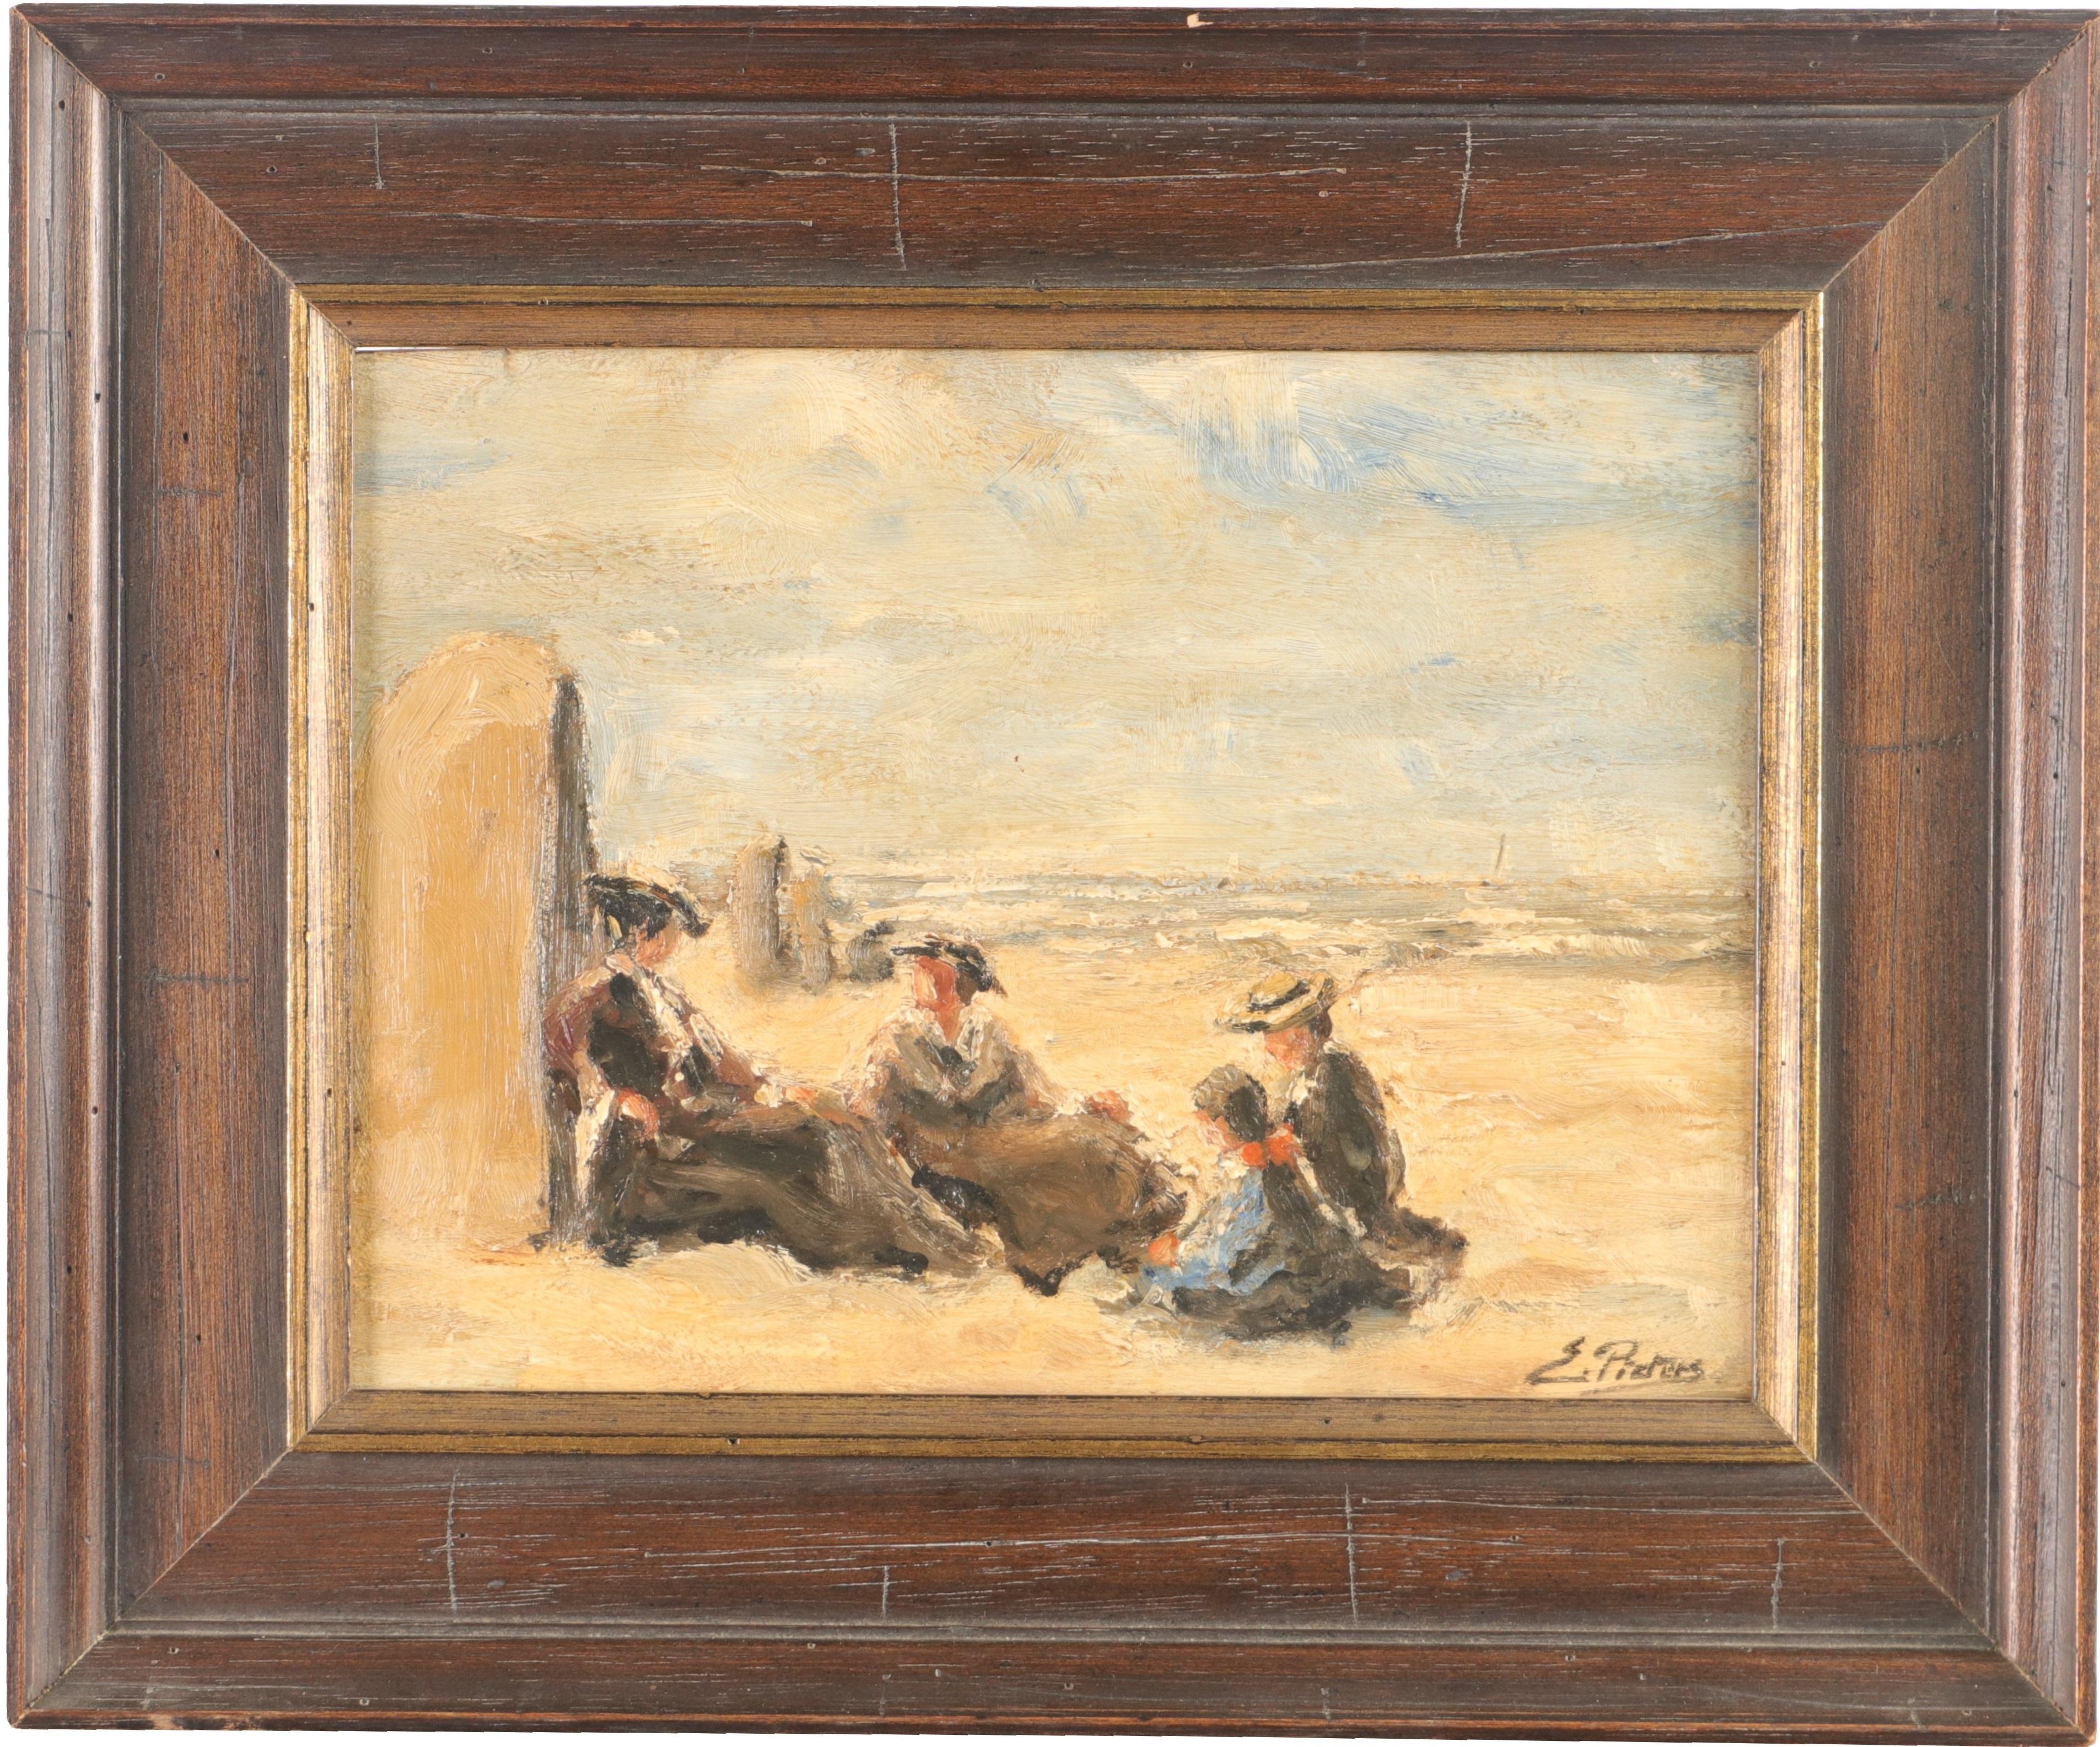 Evert PIETERS (1856 -1932)